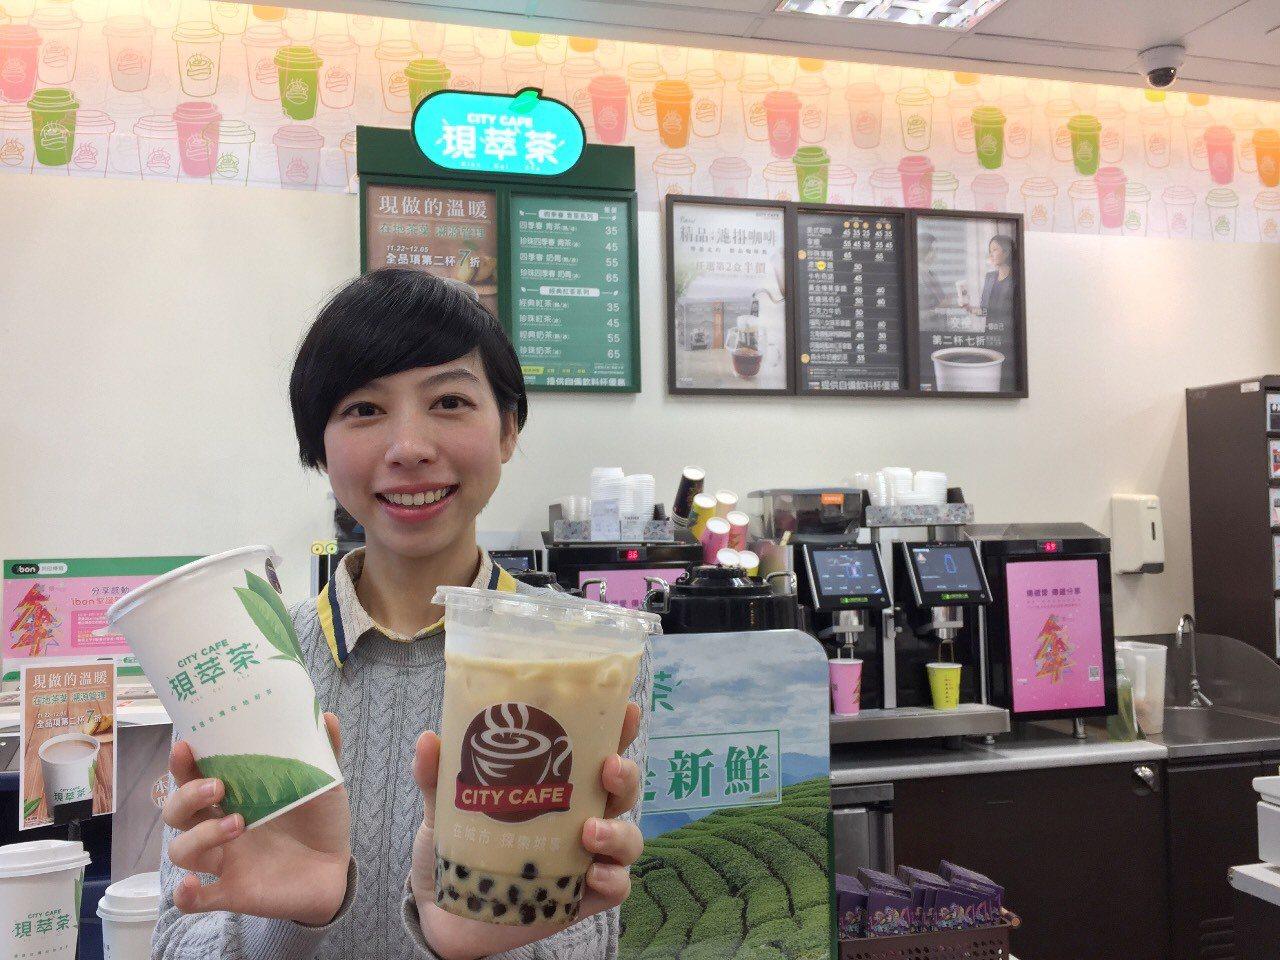 7-ELEVEN全台700店將推出「CITY CAFE黑糖珍珠撞奶」,是全球便利...